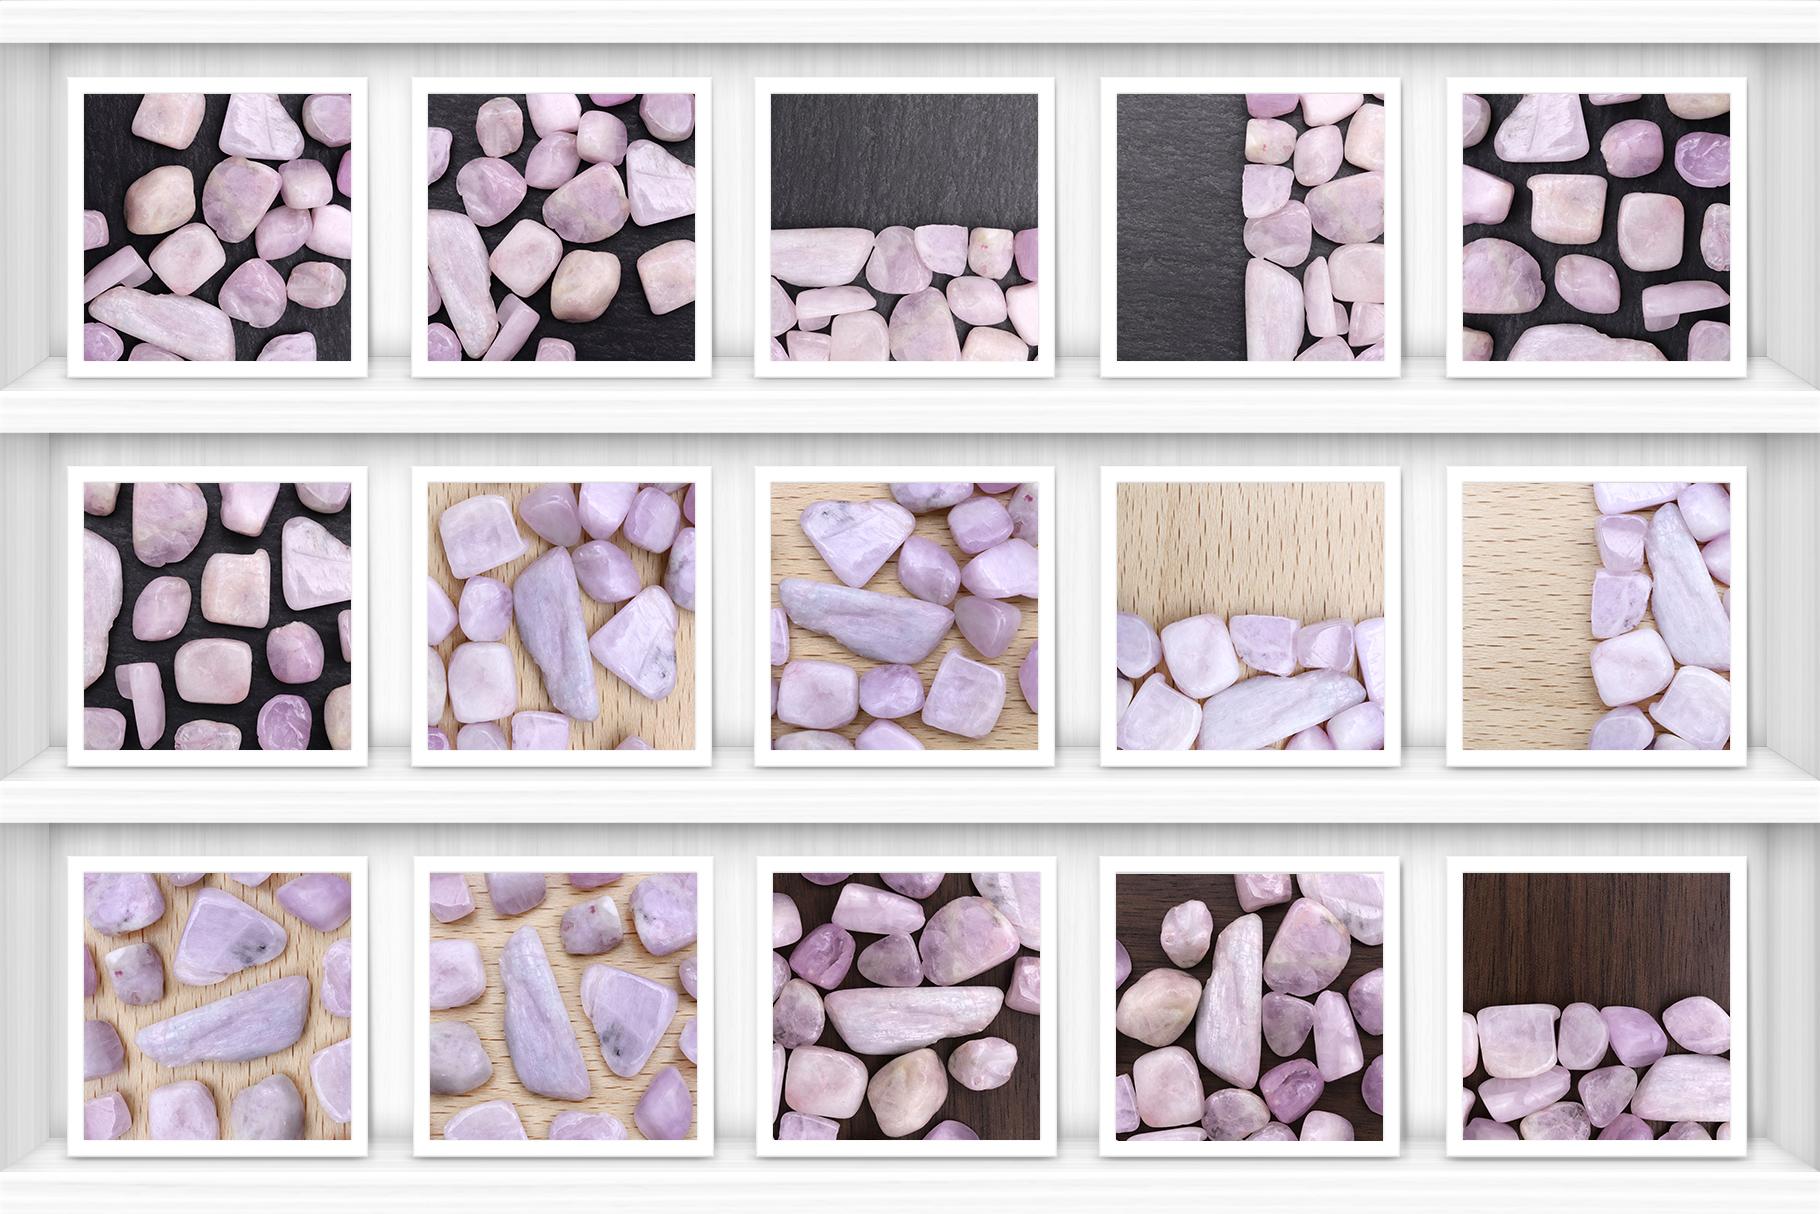 Morganite Background Textures Showcase Shelves Samples Preview